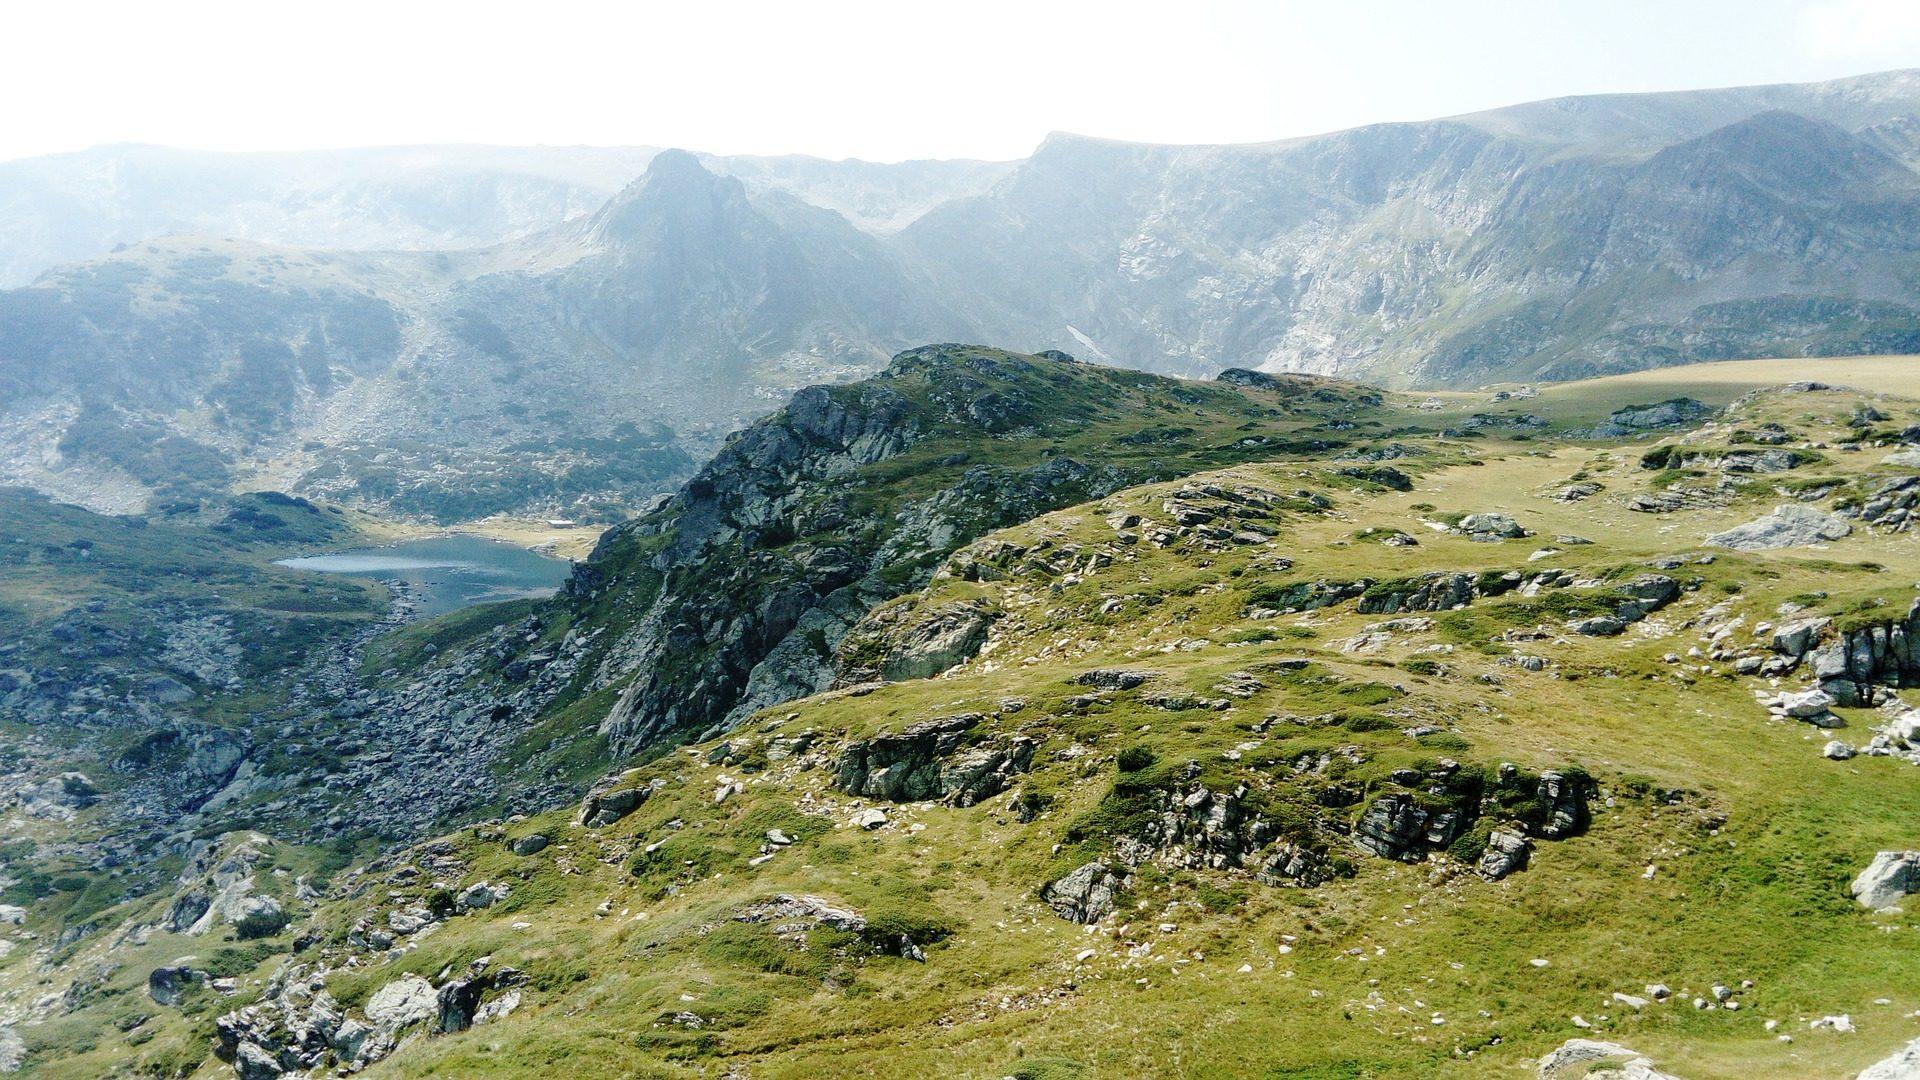 Montañas, πέτρες, Rocas, ύψη, υψόμετρο, απόσταση - Wallpapers HD - Professor-falken.com